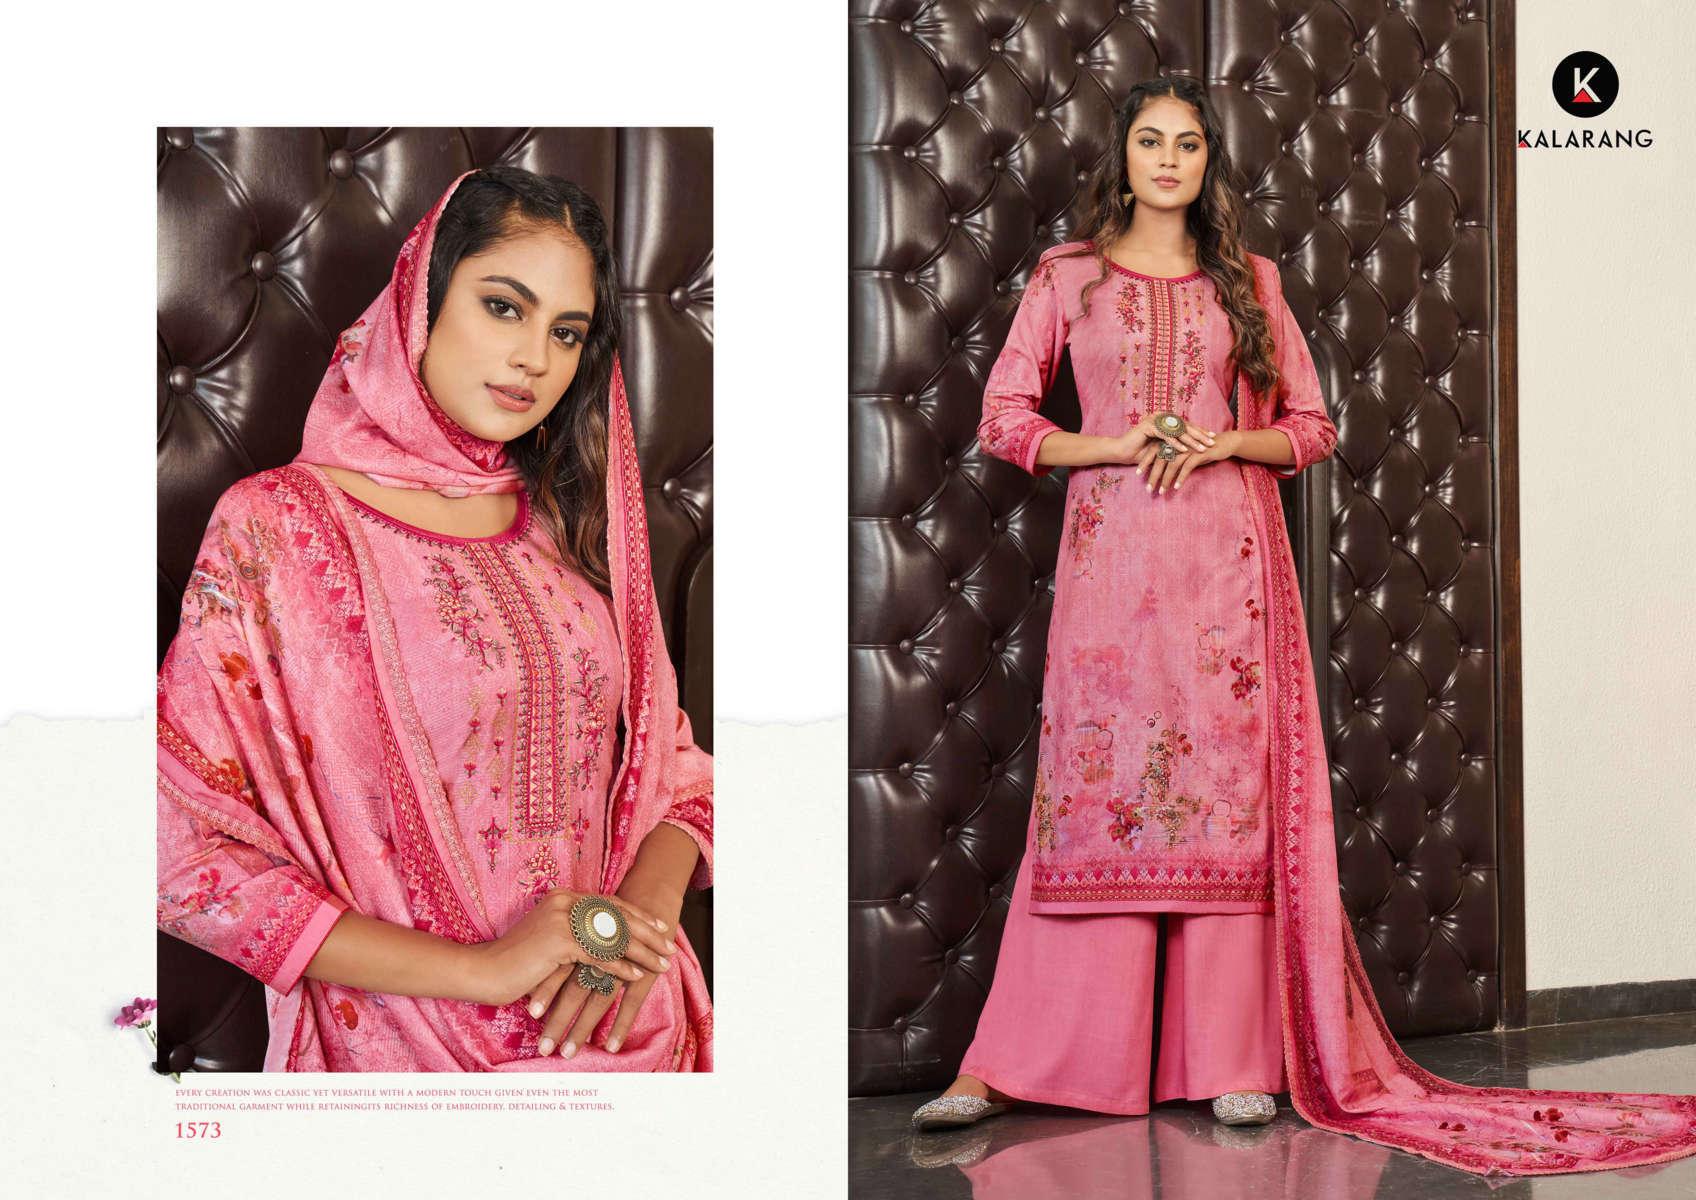 Kalarang Charming Vol 3 by Kessi Salwar Suit Wholesale Catalog 4 Pcs 5 - Kalarang Charming Vol 3 by Kessi Salwar Suit Wholesale Catalog 4 Pcs